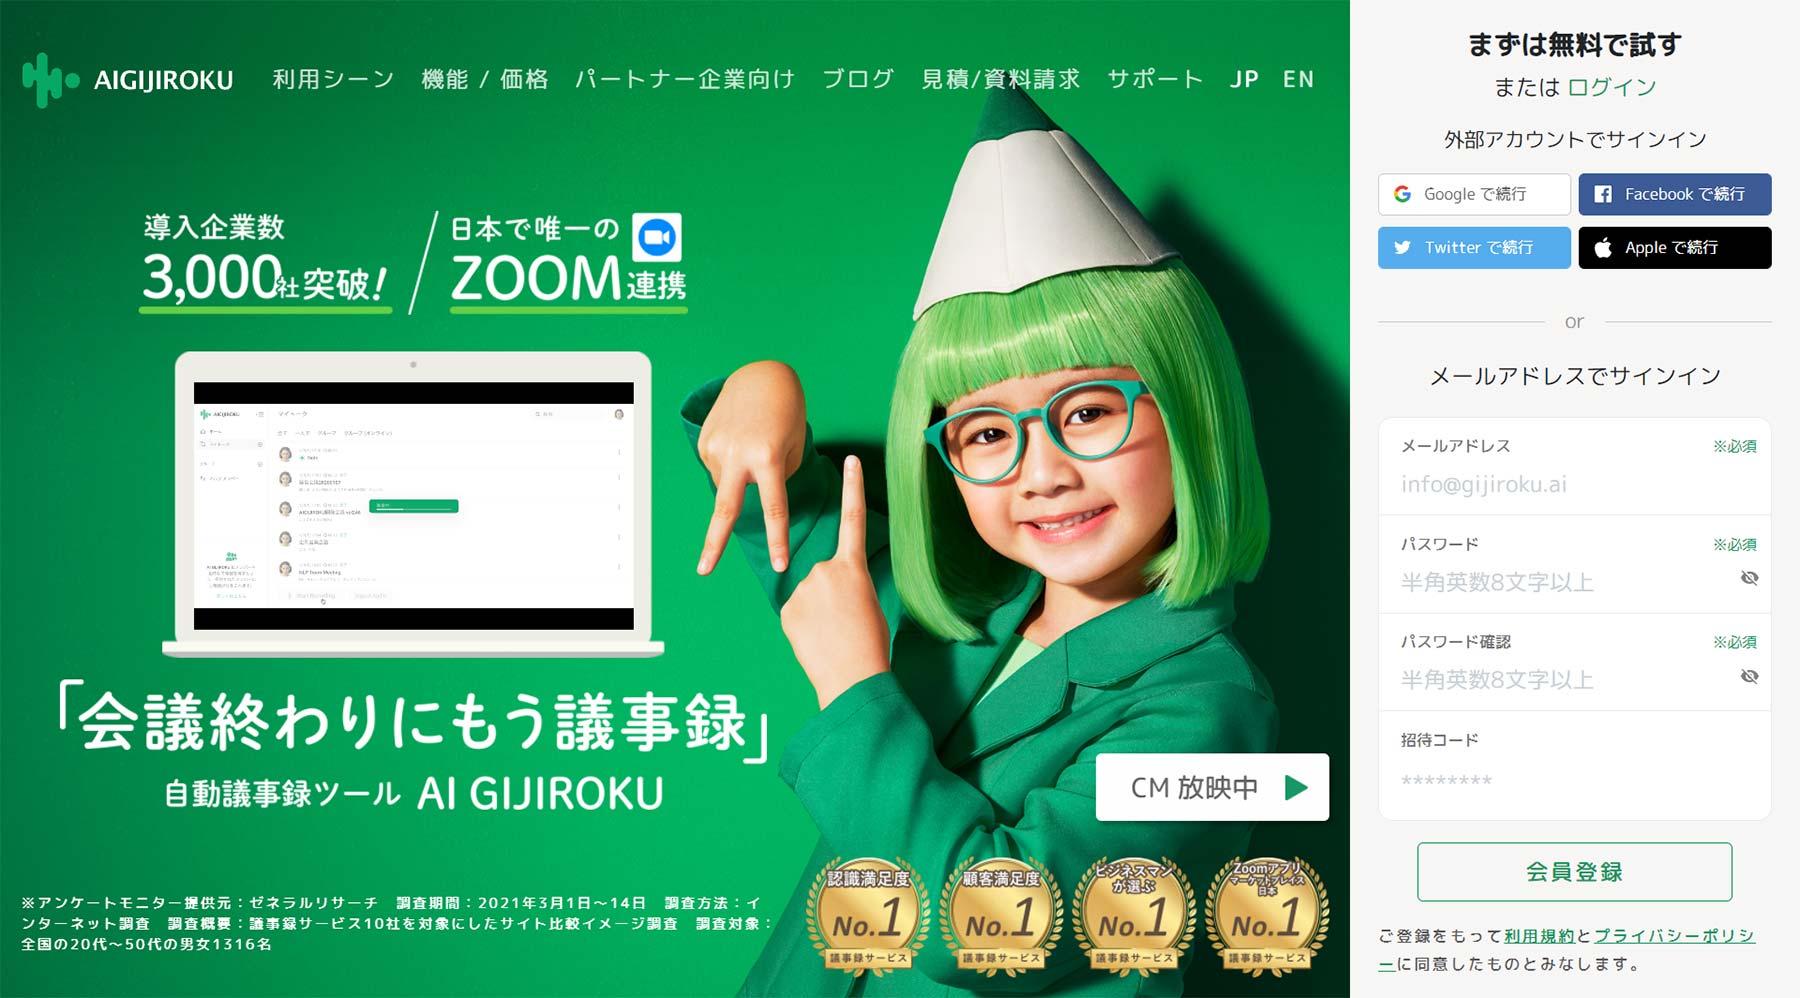 AI GIJIROKU公式Webサイト